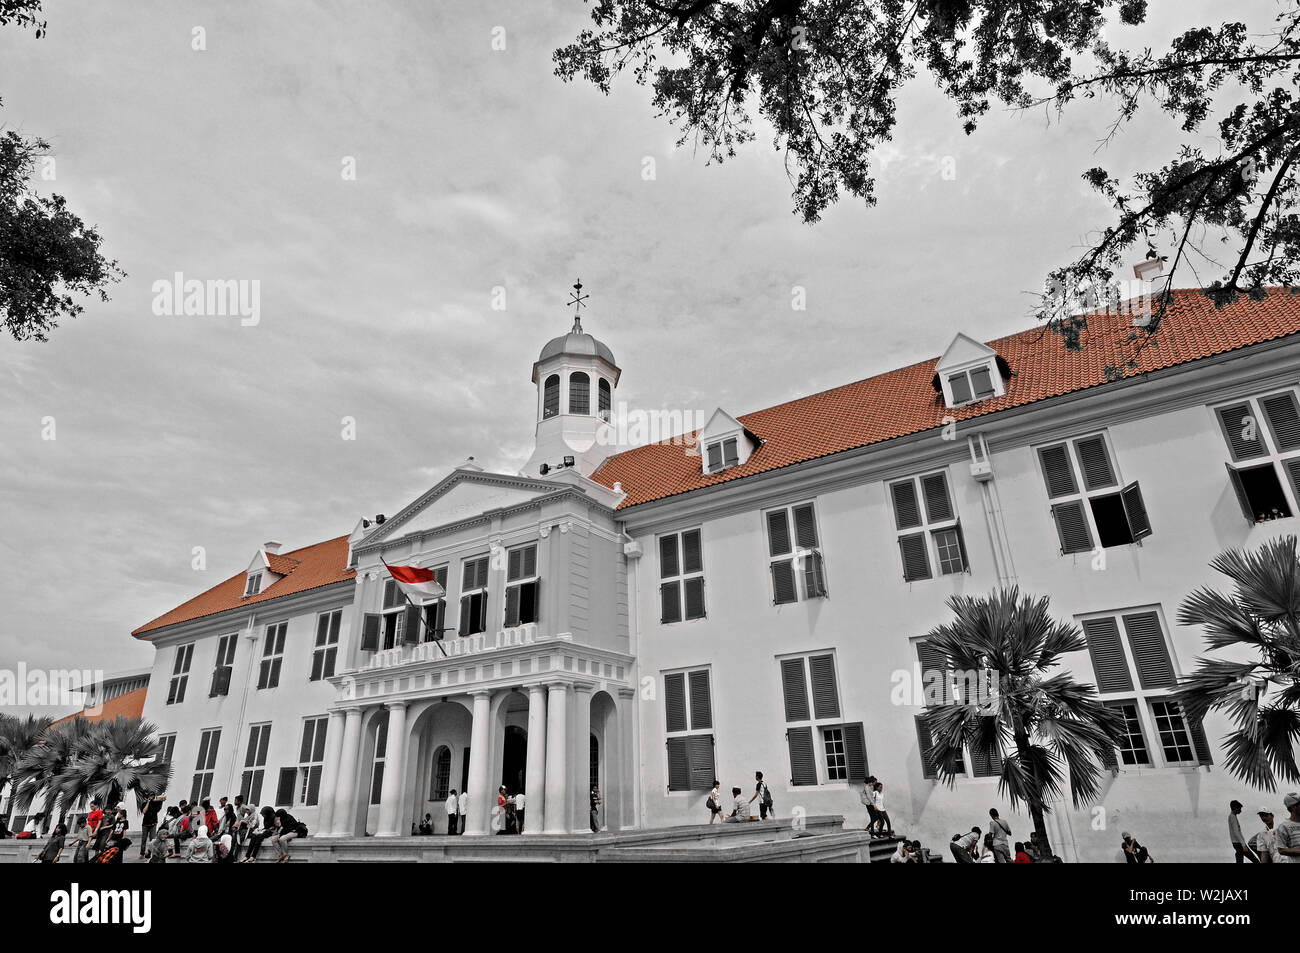 jakarta, dki jakarta/indonesia - may 05, 2010: the historic city hall of batavia at taman fatahillah in kota tua - Stock Image